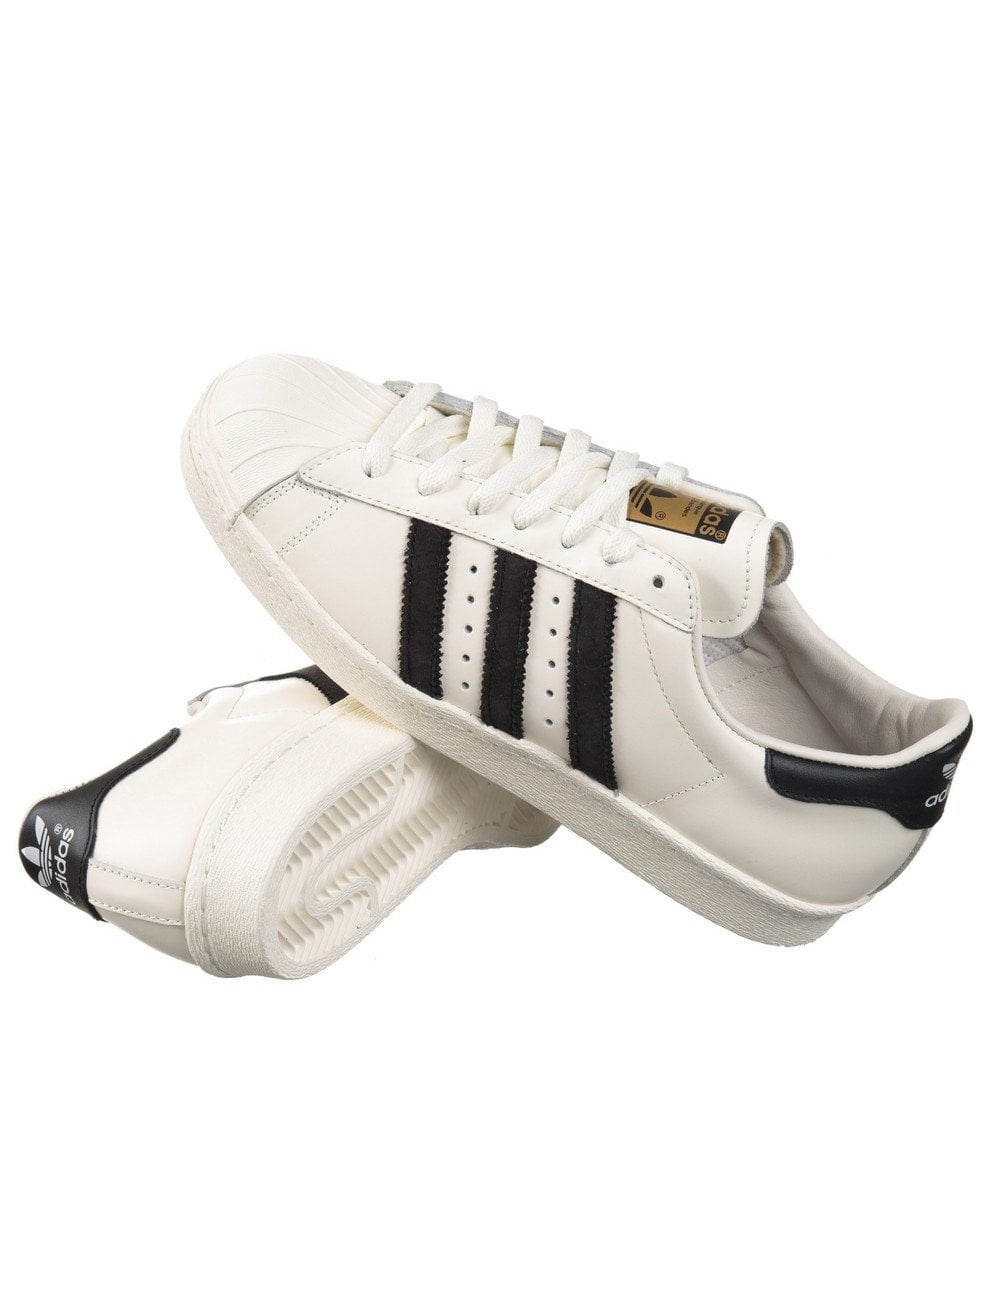 29c46ea049c7 Buy adidas originals superstar 80s mens purple   OFF50% Discounted